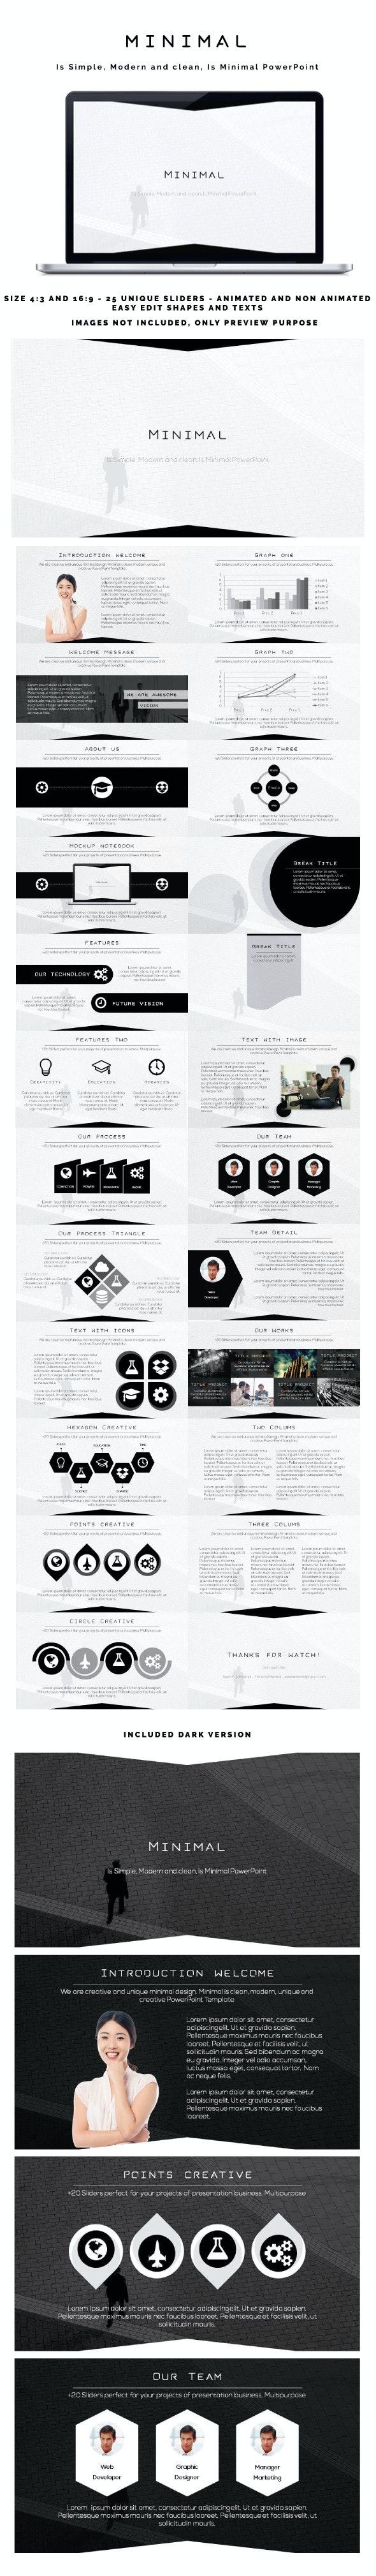 Minimal PowerPoint - Business PowerPoint Templates